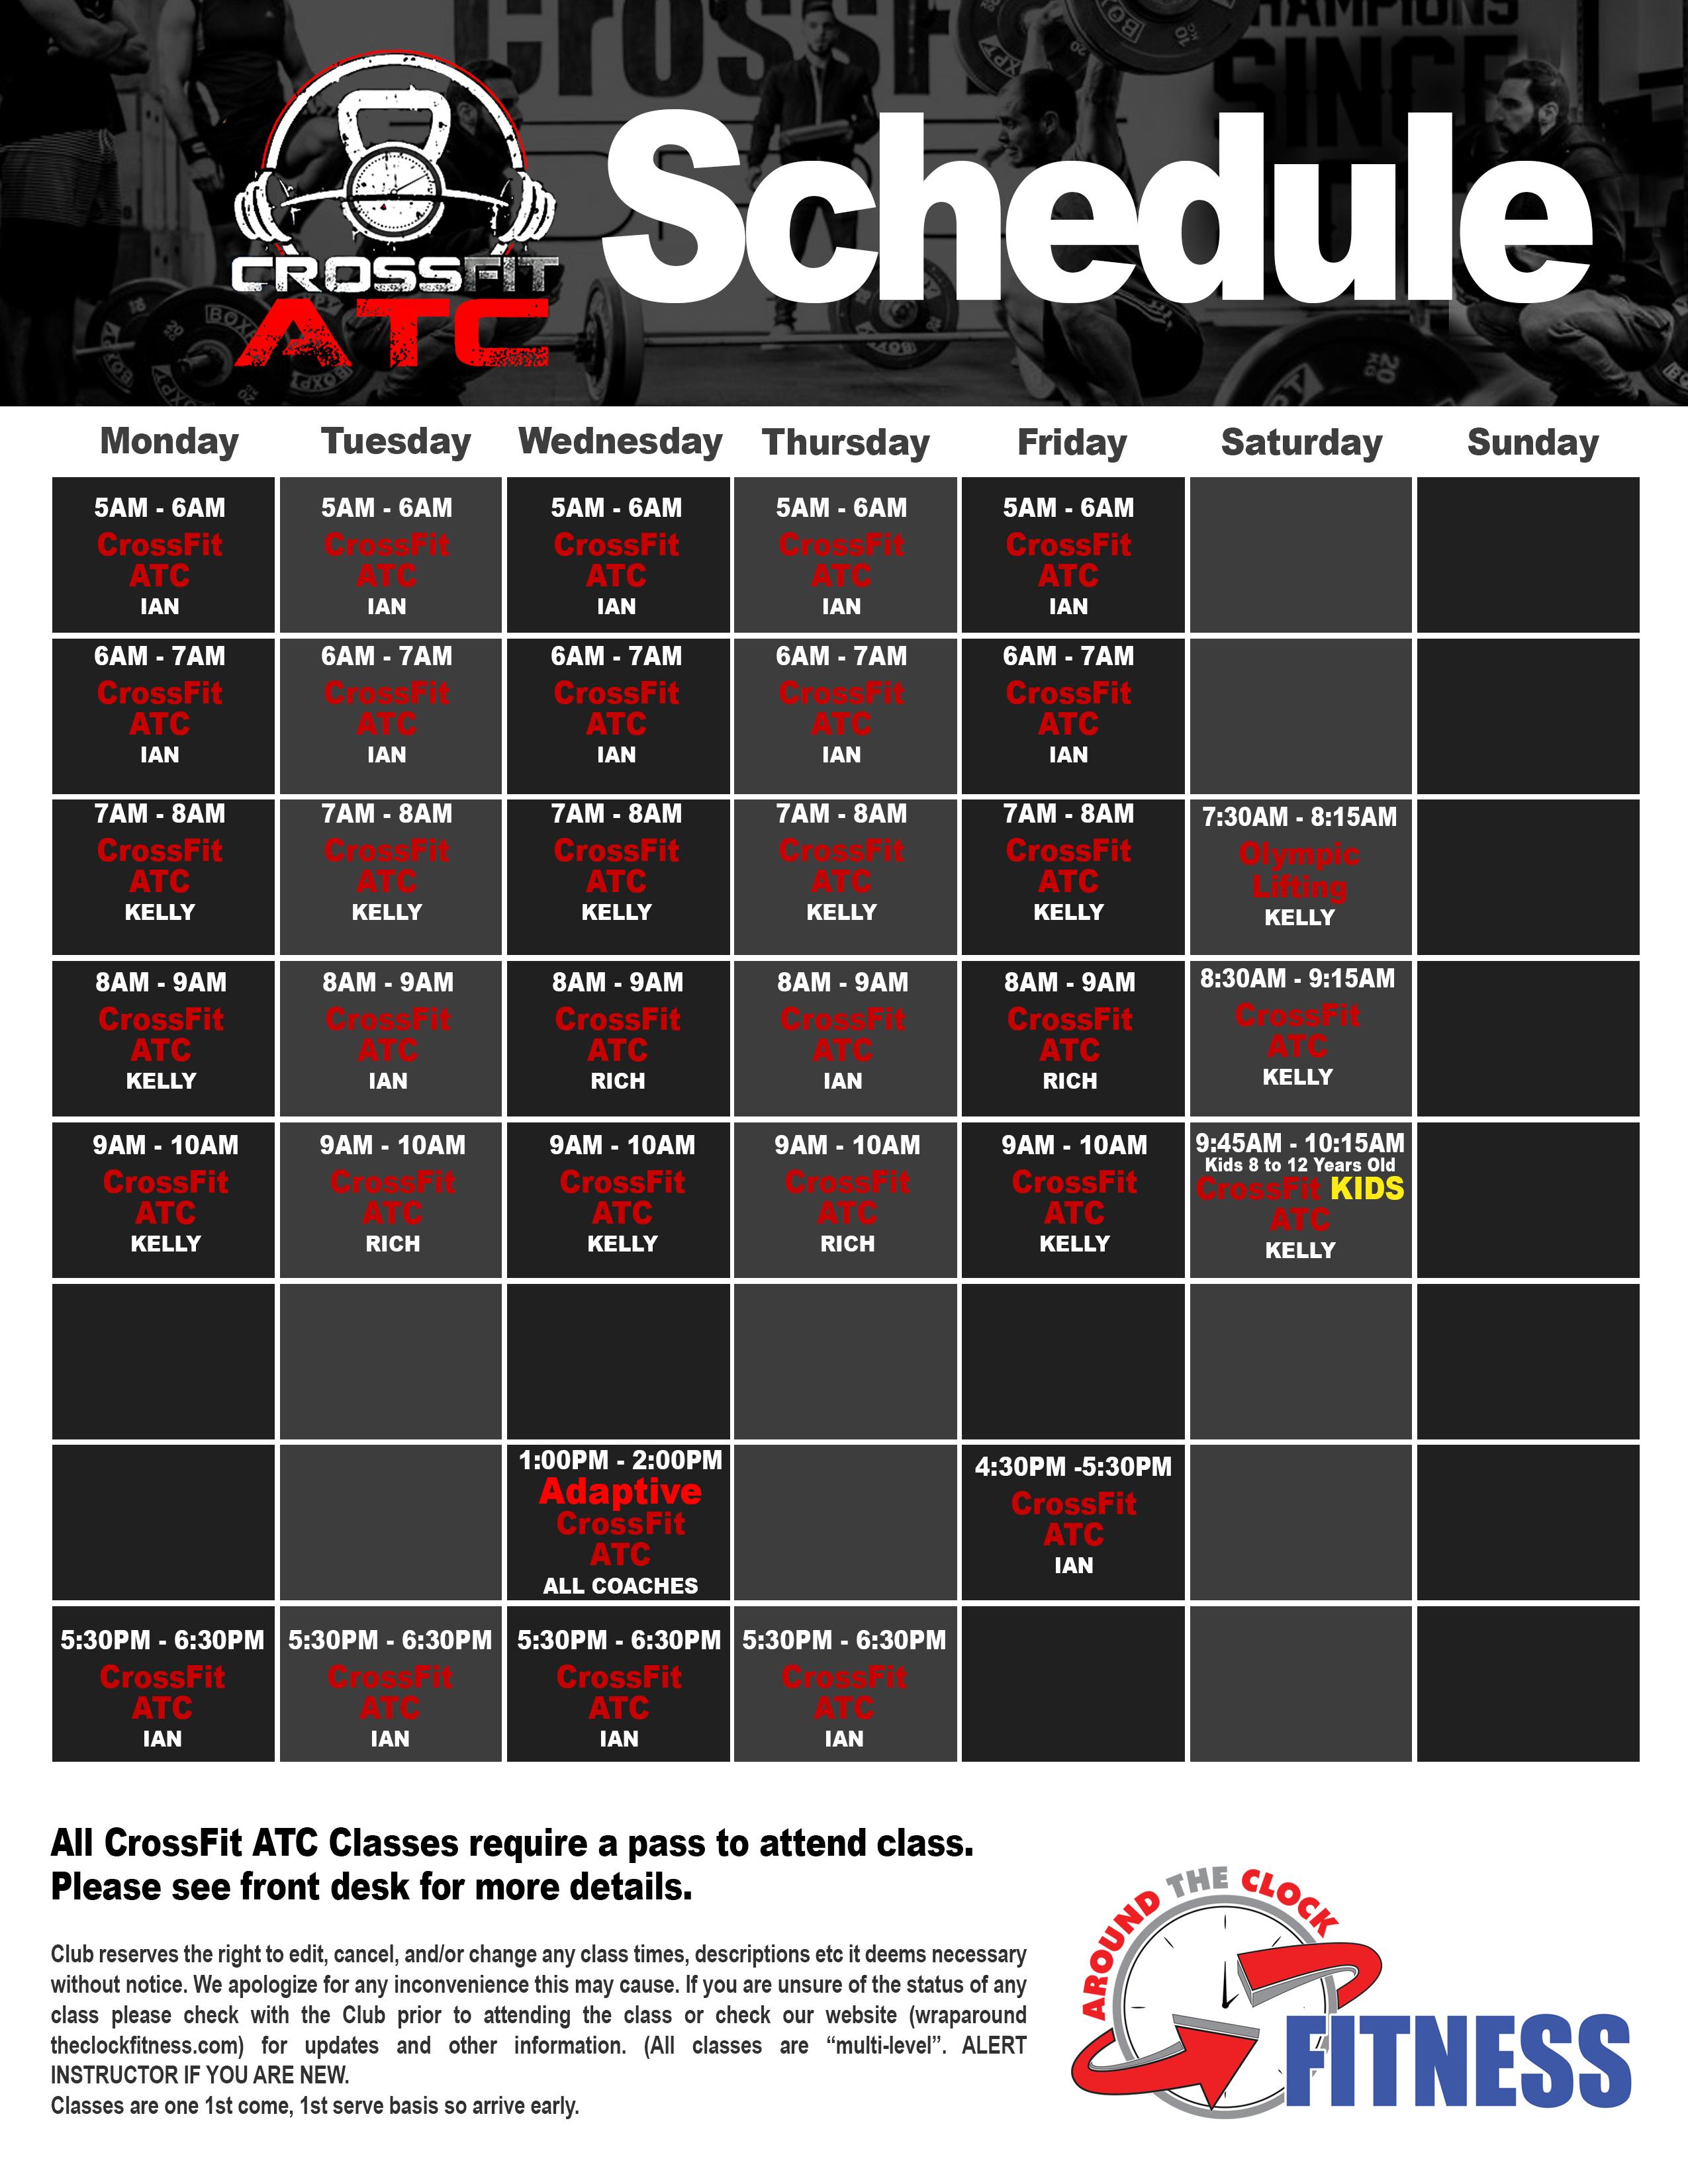 Crossfit ATC Schedule